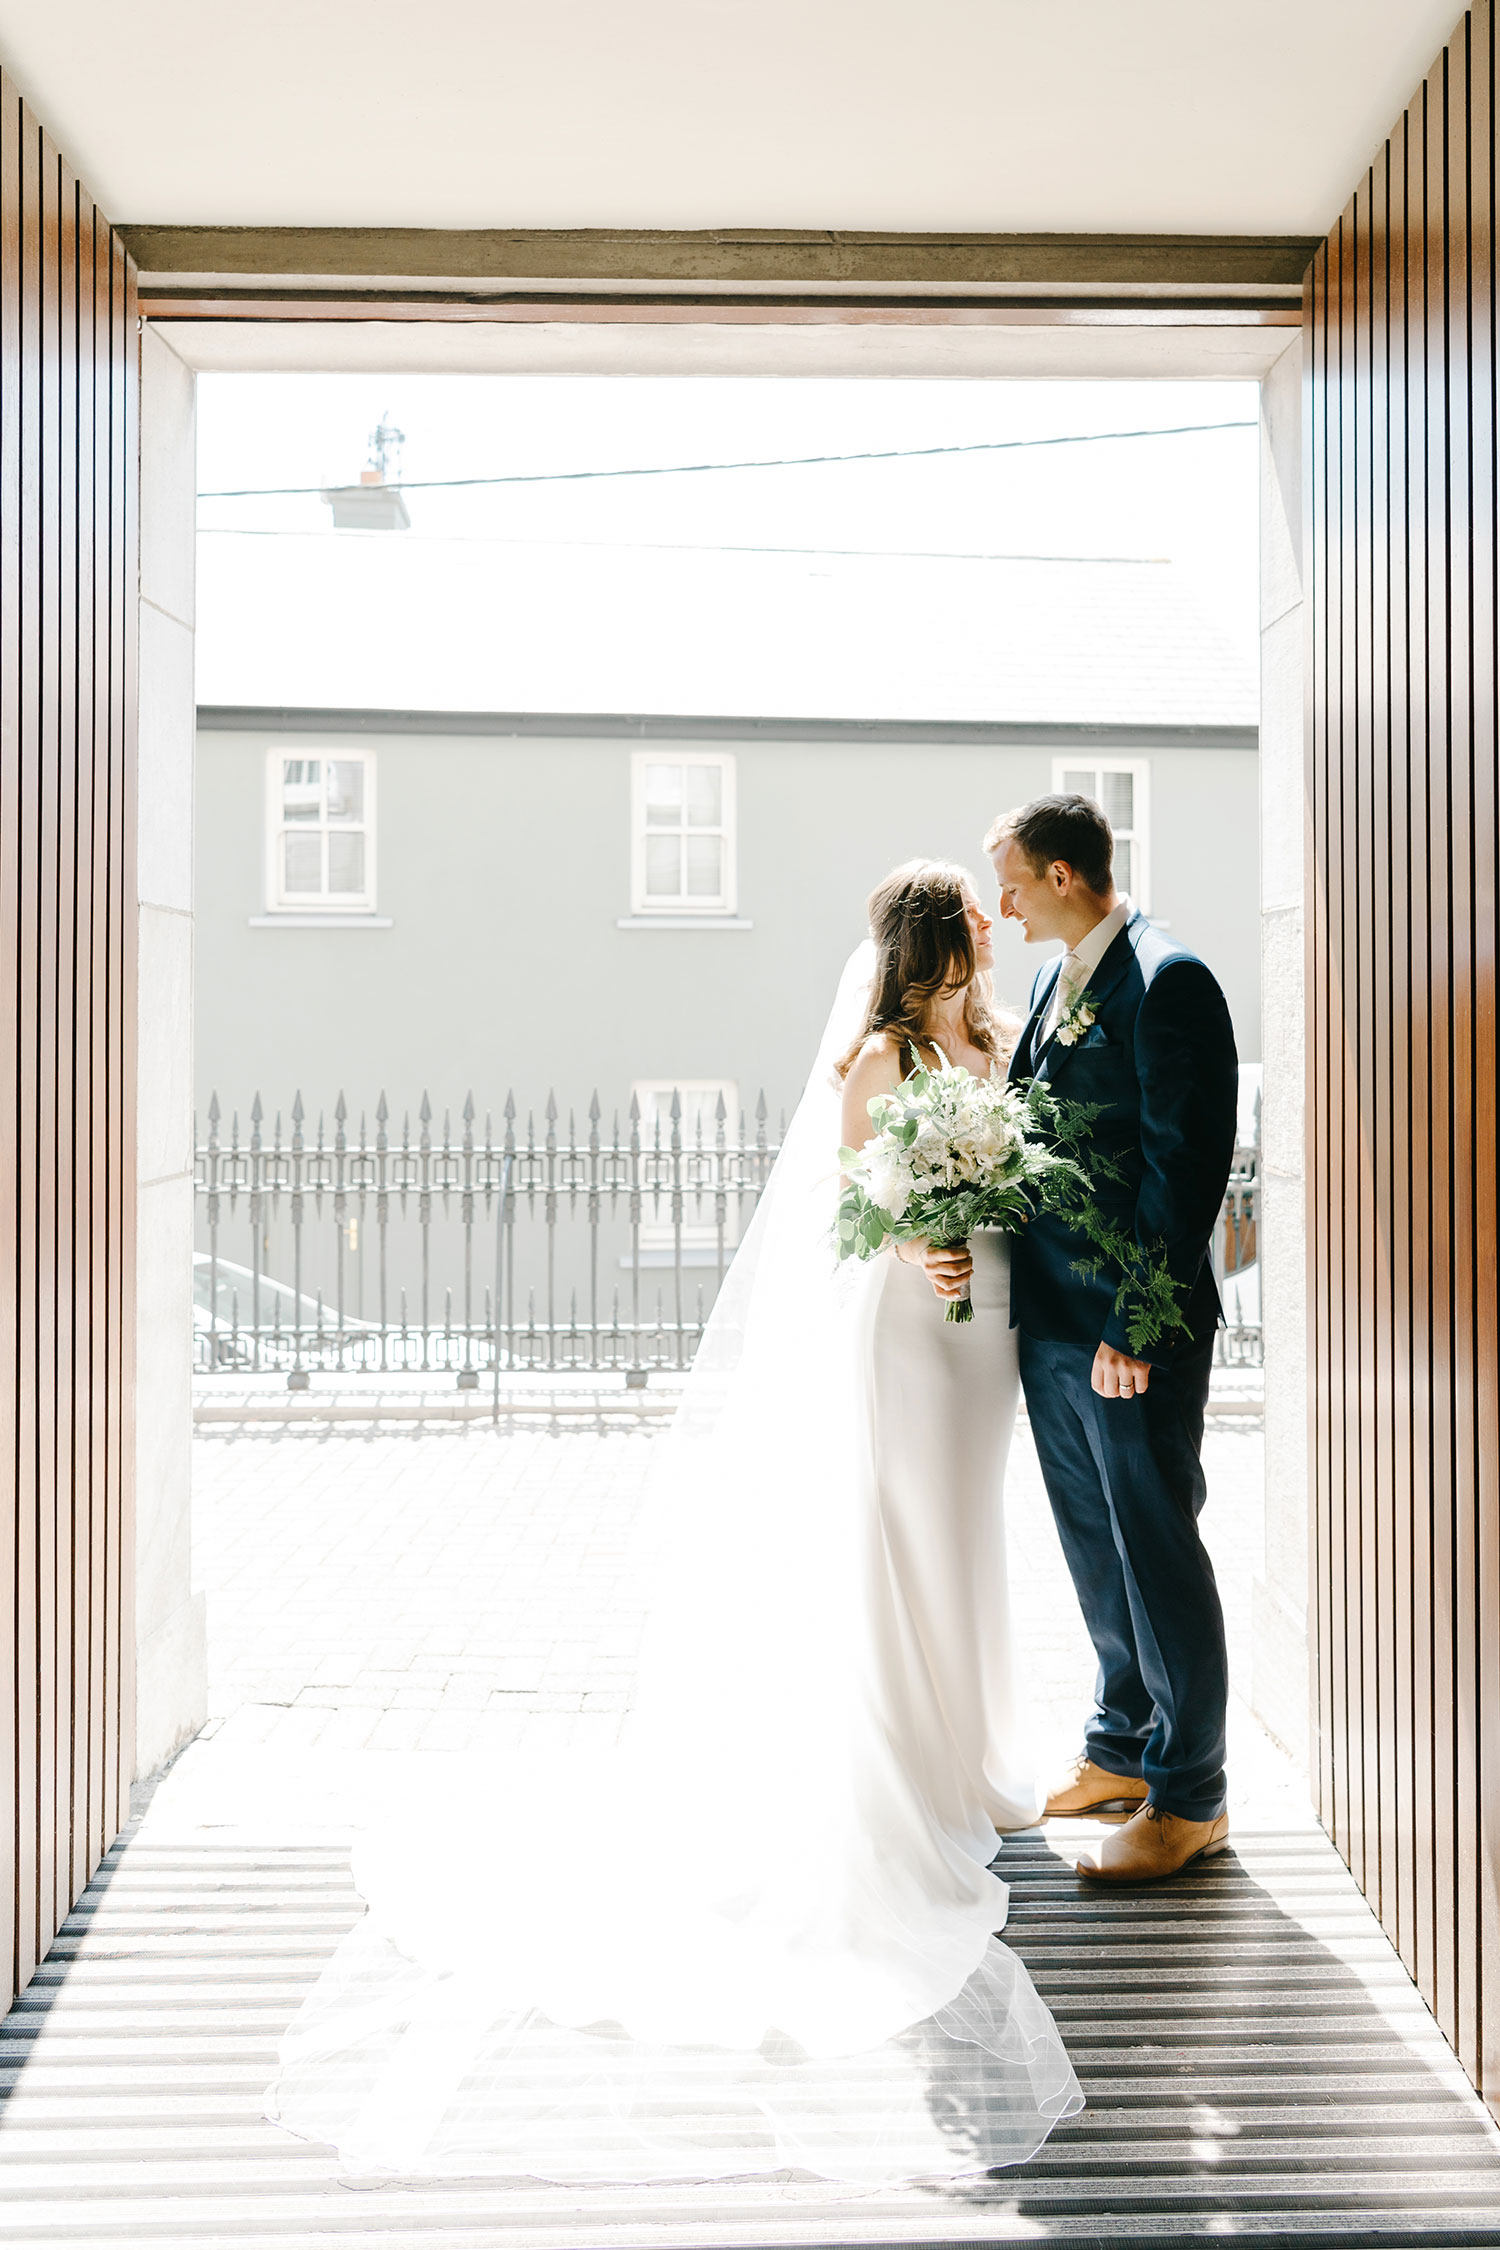 destination-wedding-photographer-ballinacurra-house-wedding-20180711_0033.jpg